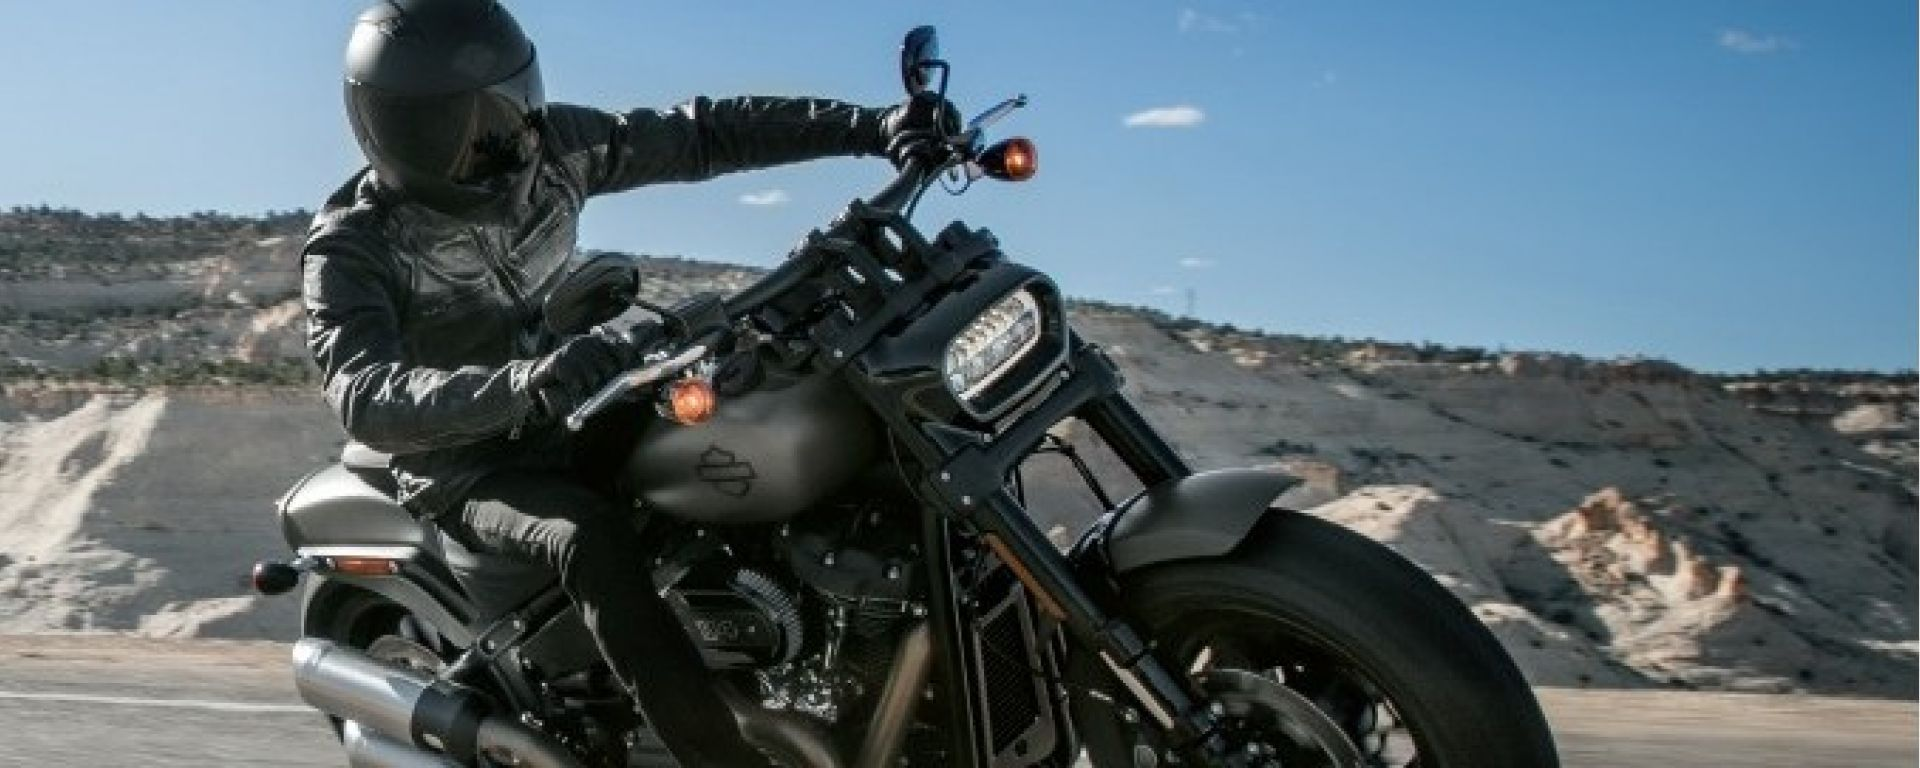 Harley-Davidson Experience: un week end da veri bikers